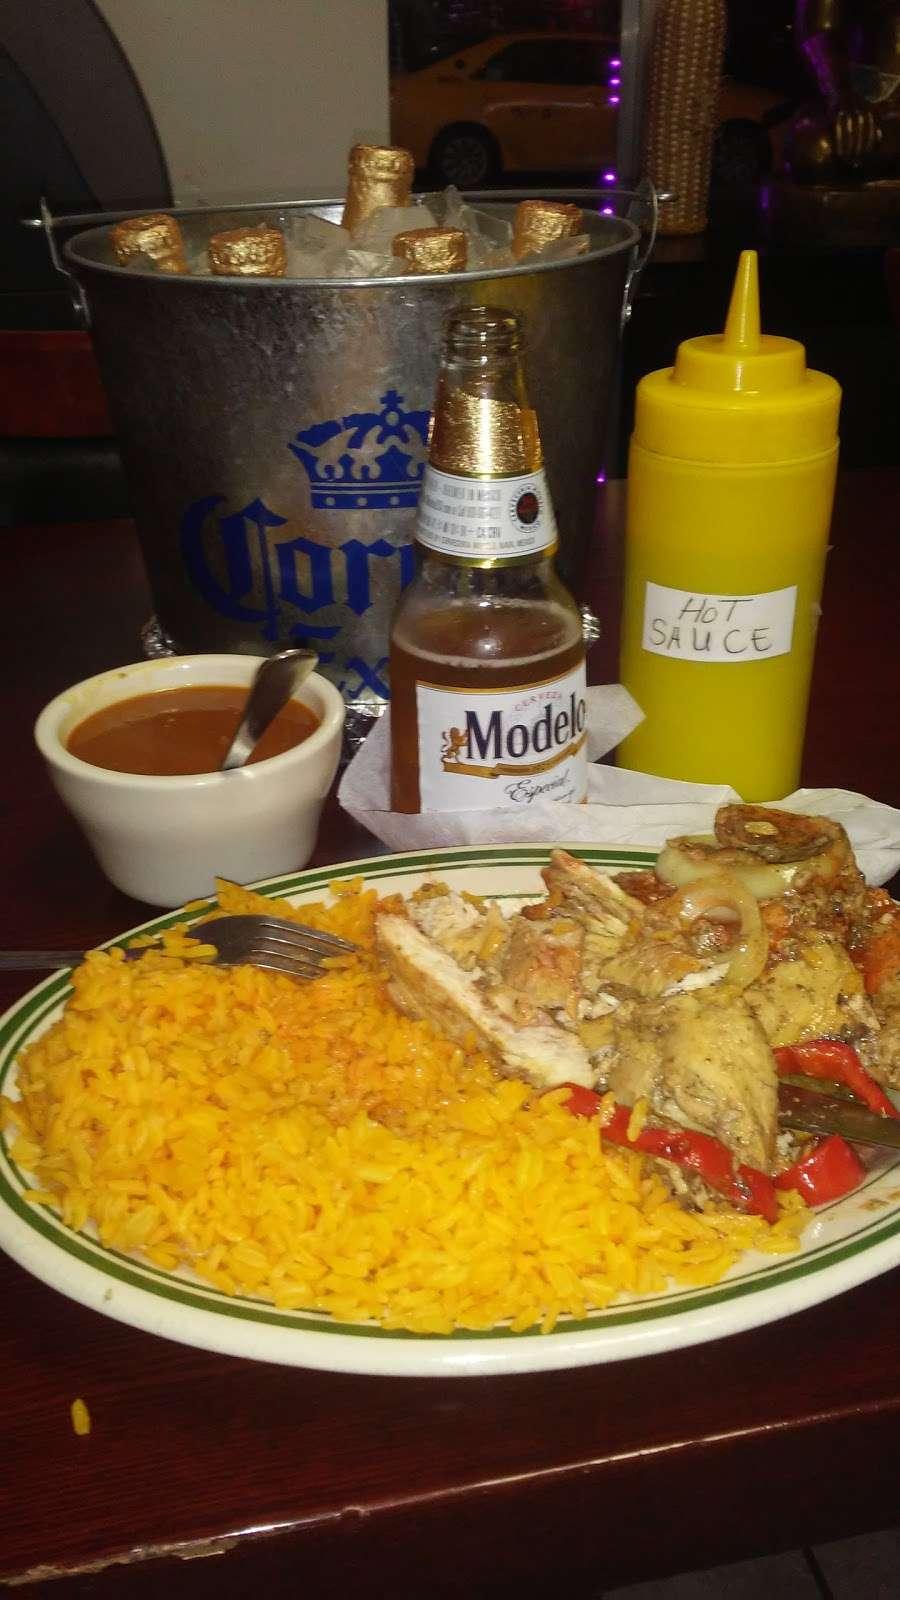 Las Mellas Restaurant - restaurant  | Photo 8 of 10 | Address: 1452 Westchester Ave, Bronx, NY 10472, USA | Phone: (718) 684-3010